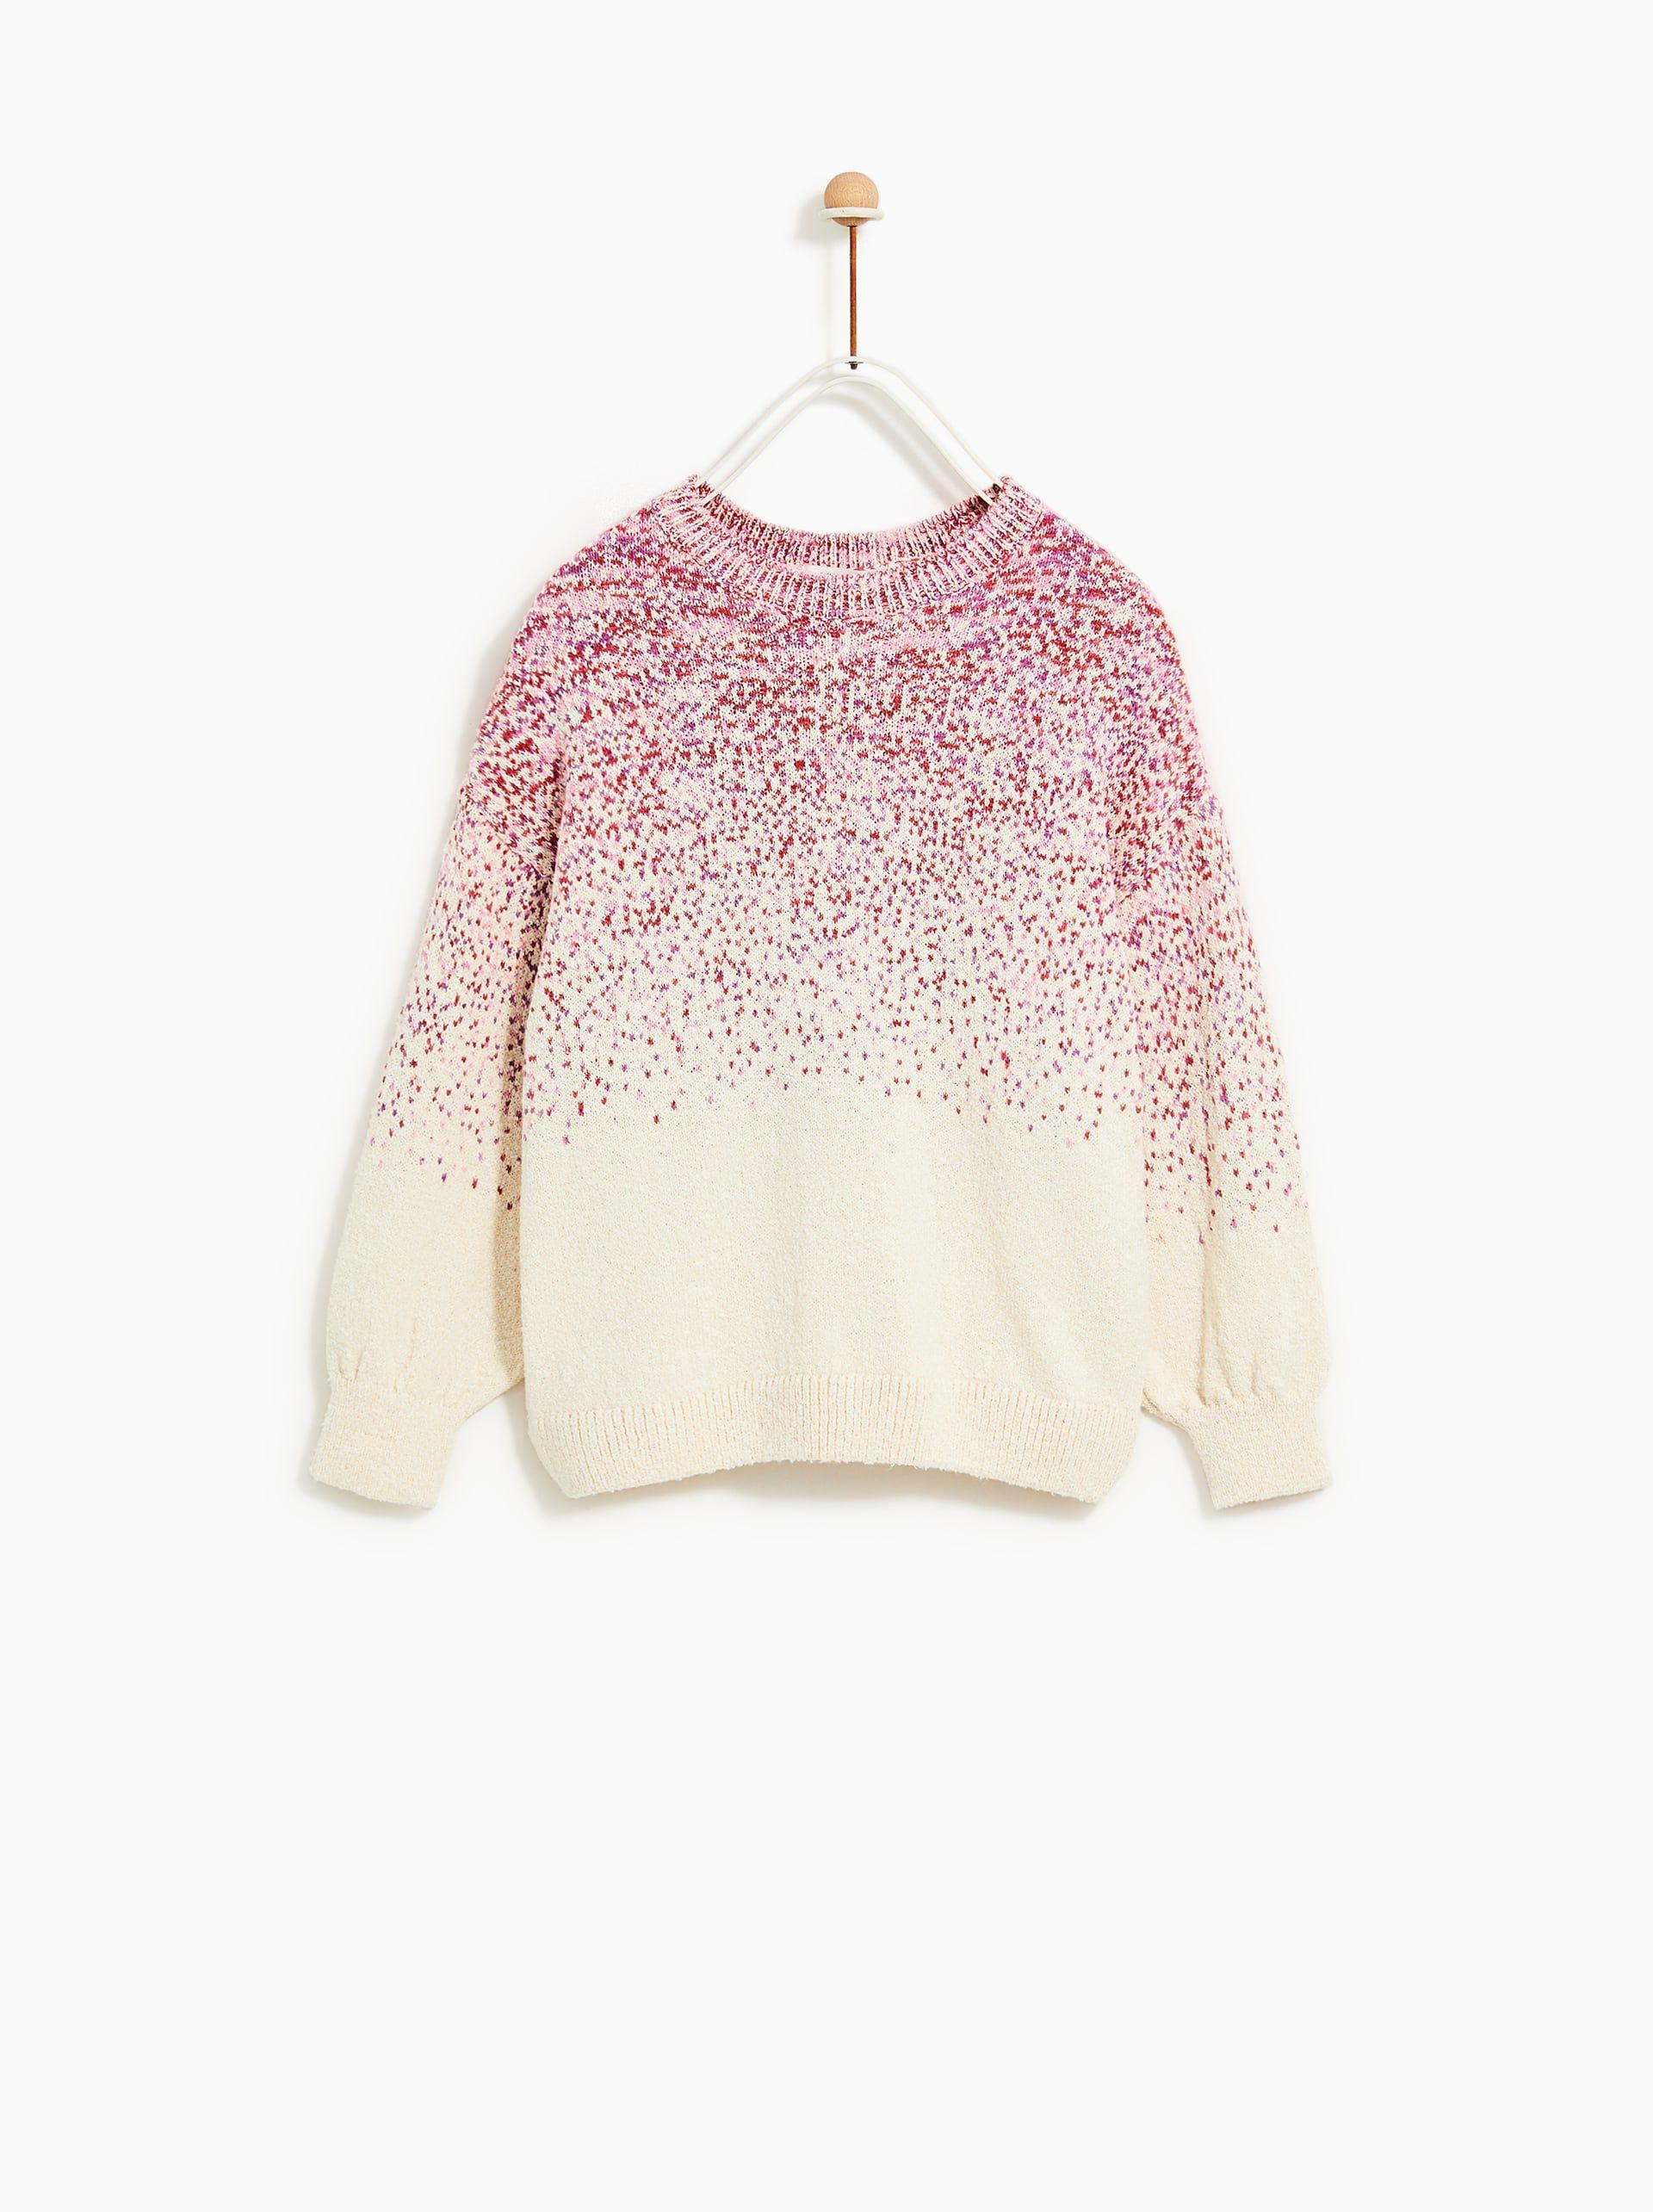 JERSEY DEGRADADO | Moda suéter, Zara kids y Ropa tumblr